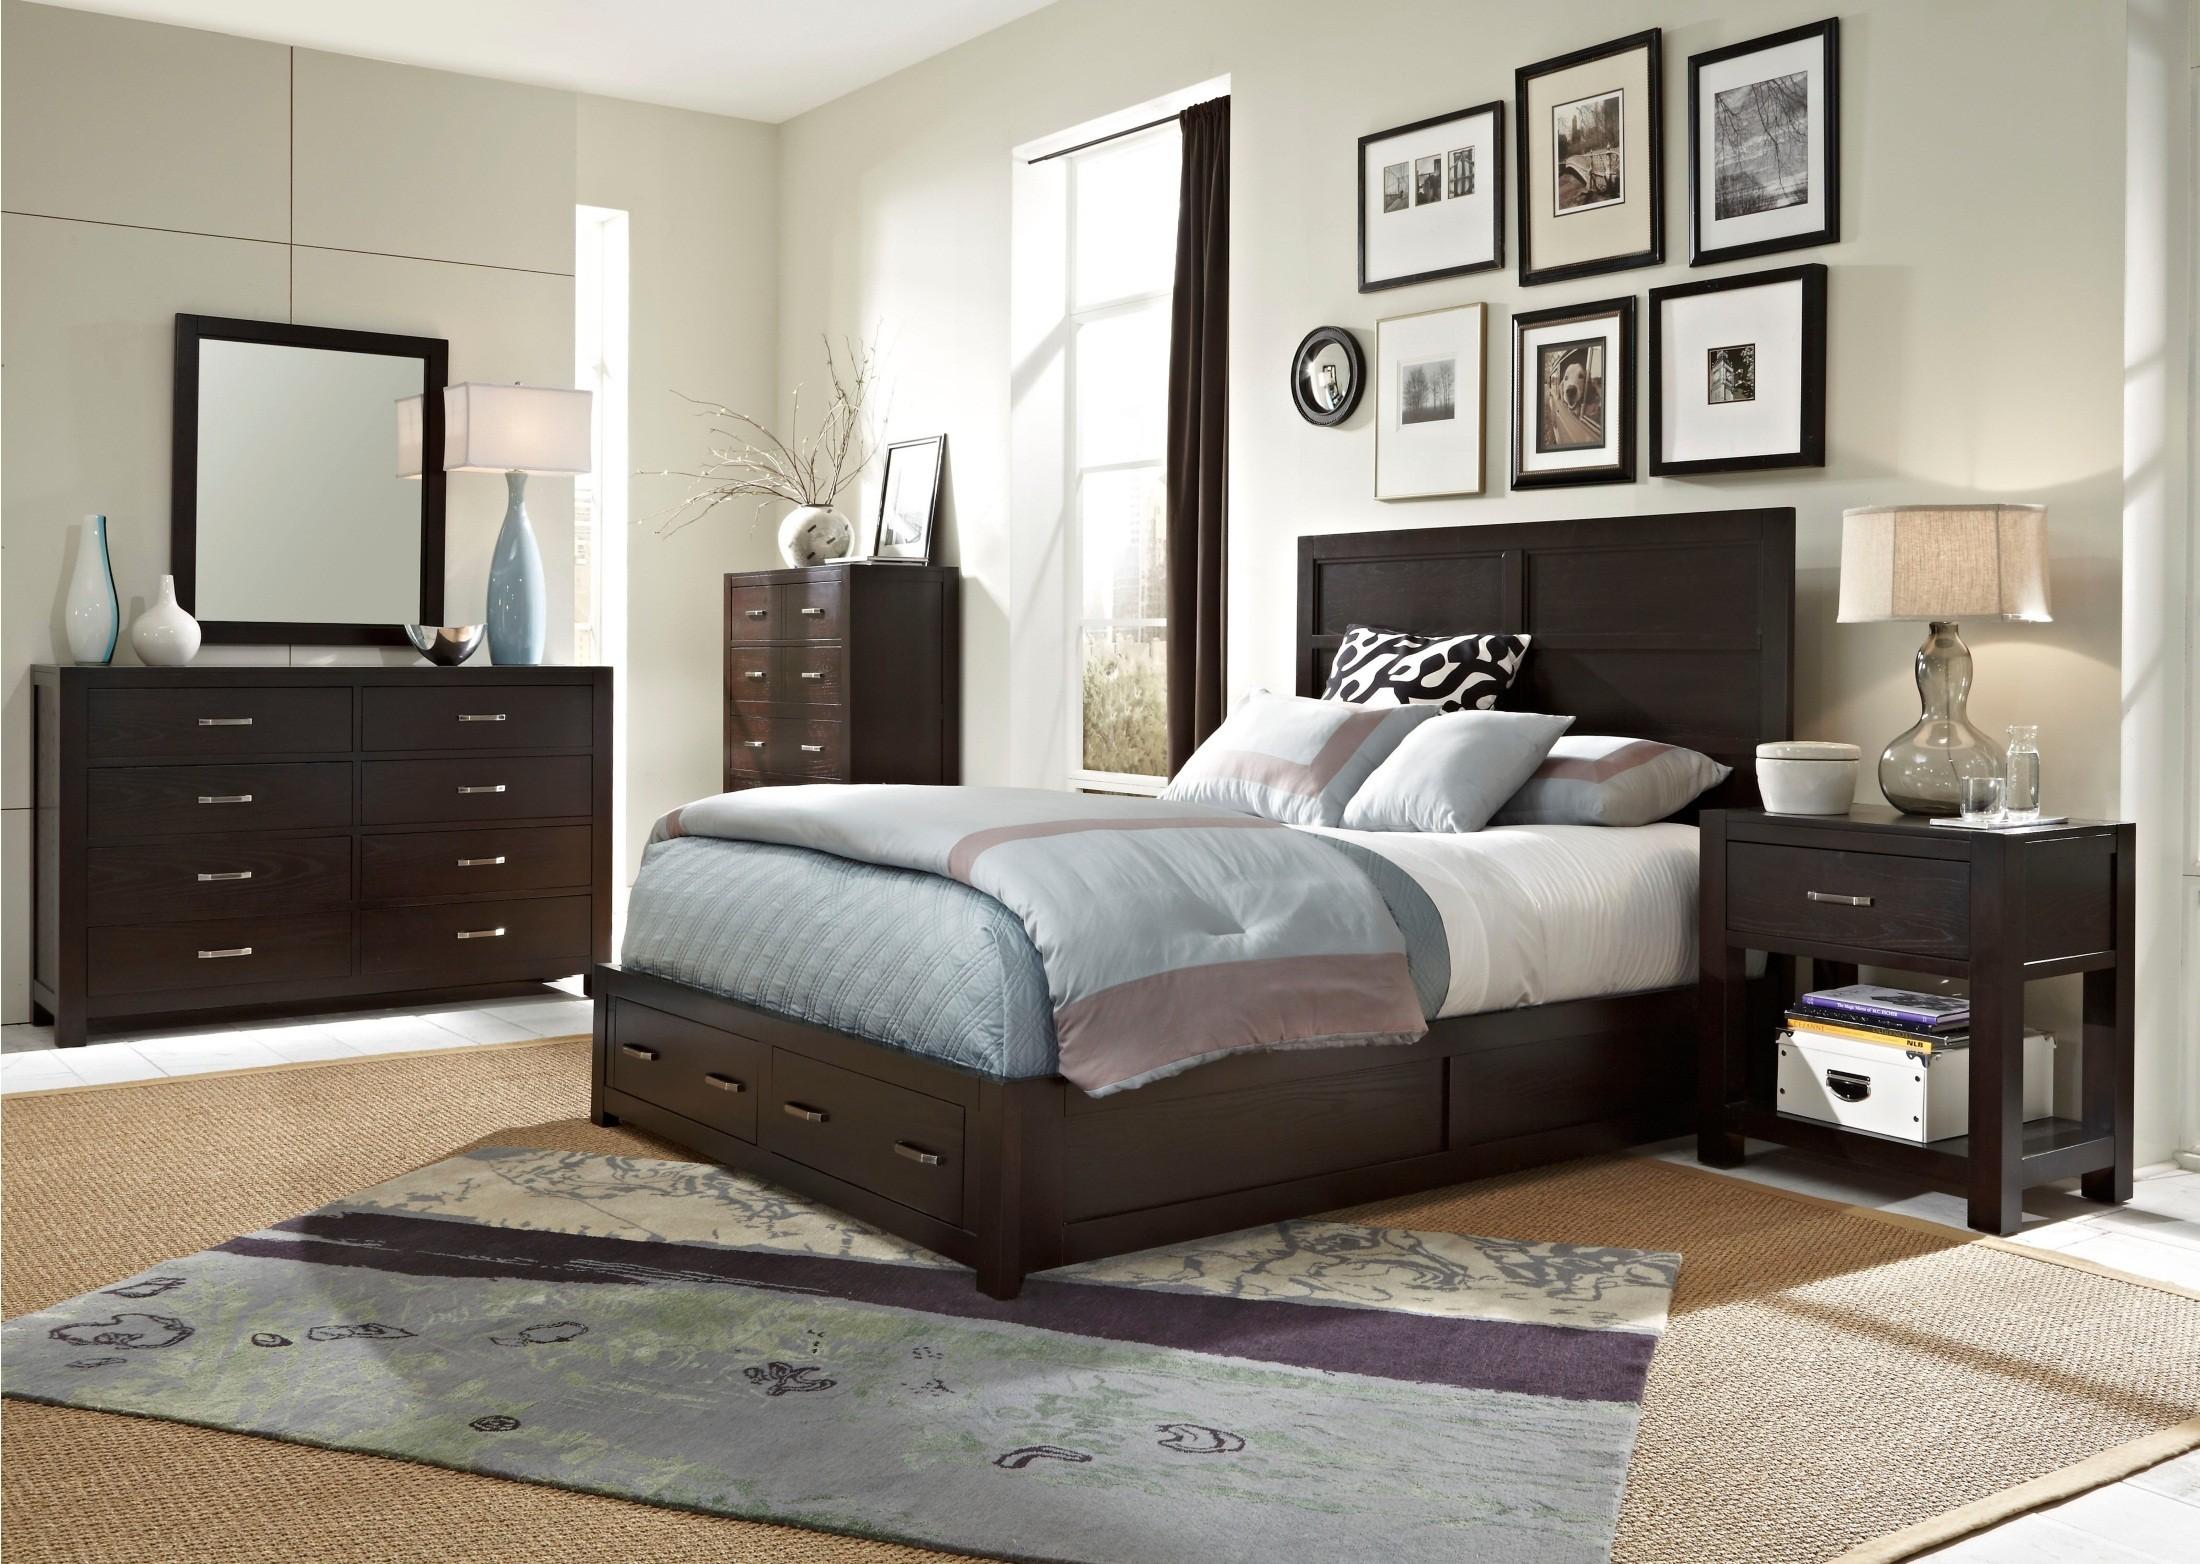 Primo Vista Panel Storage Bedroom Set from Broyhill 4453